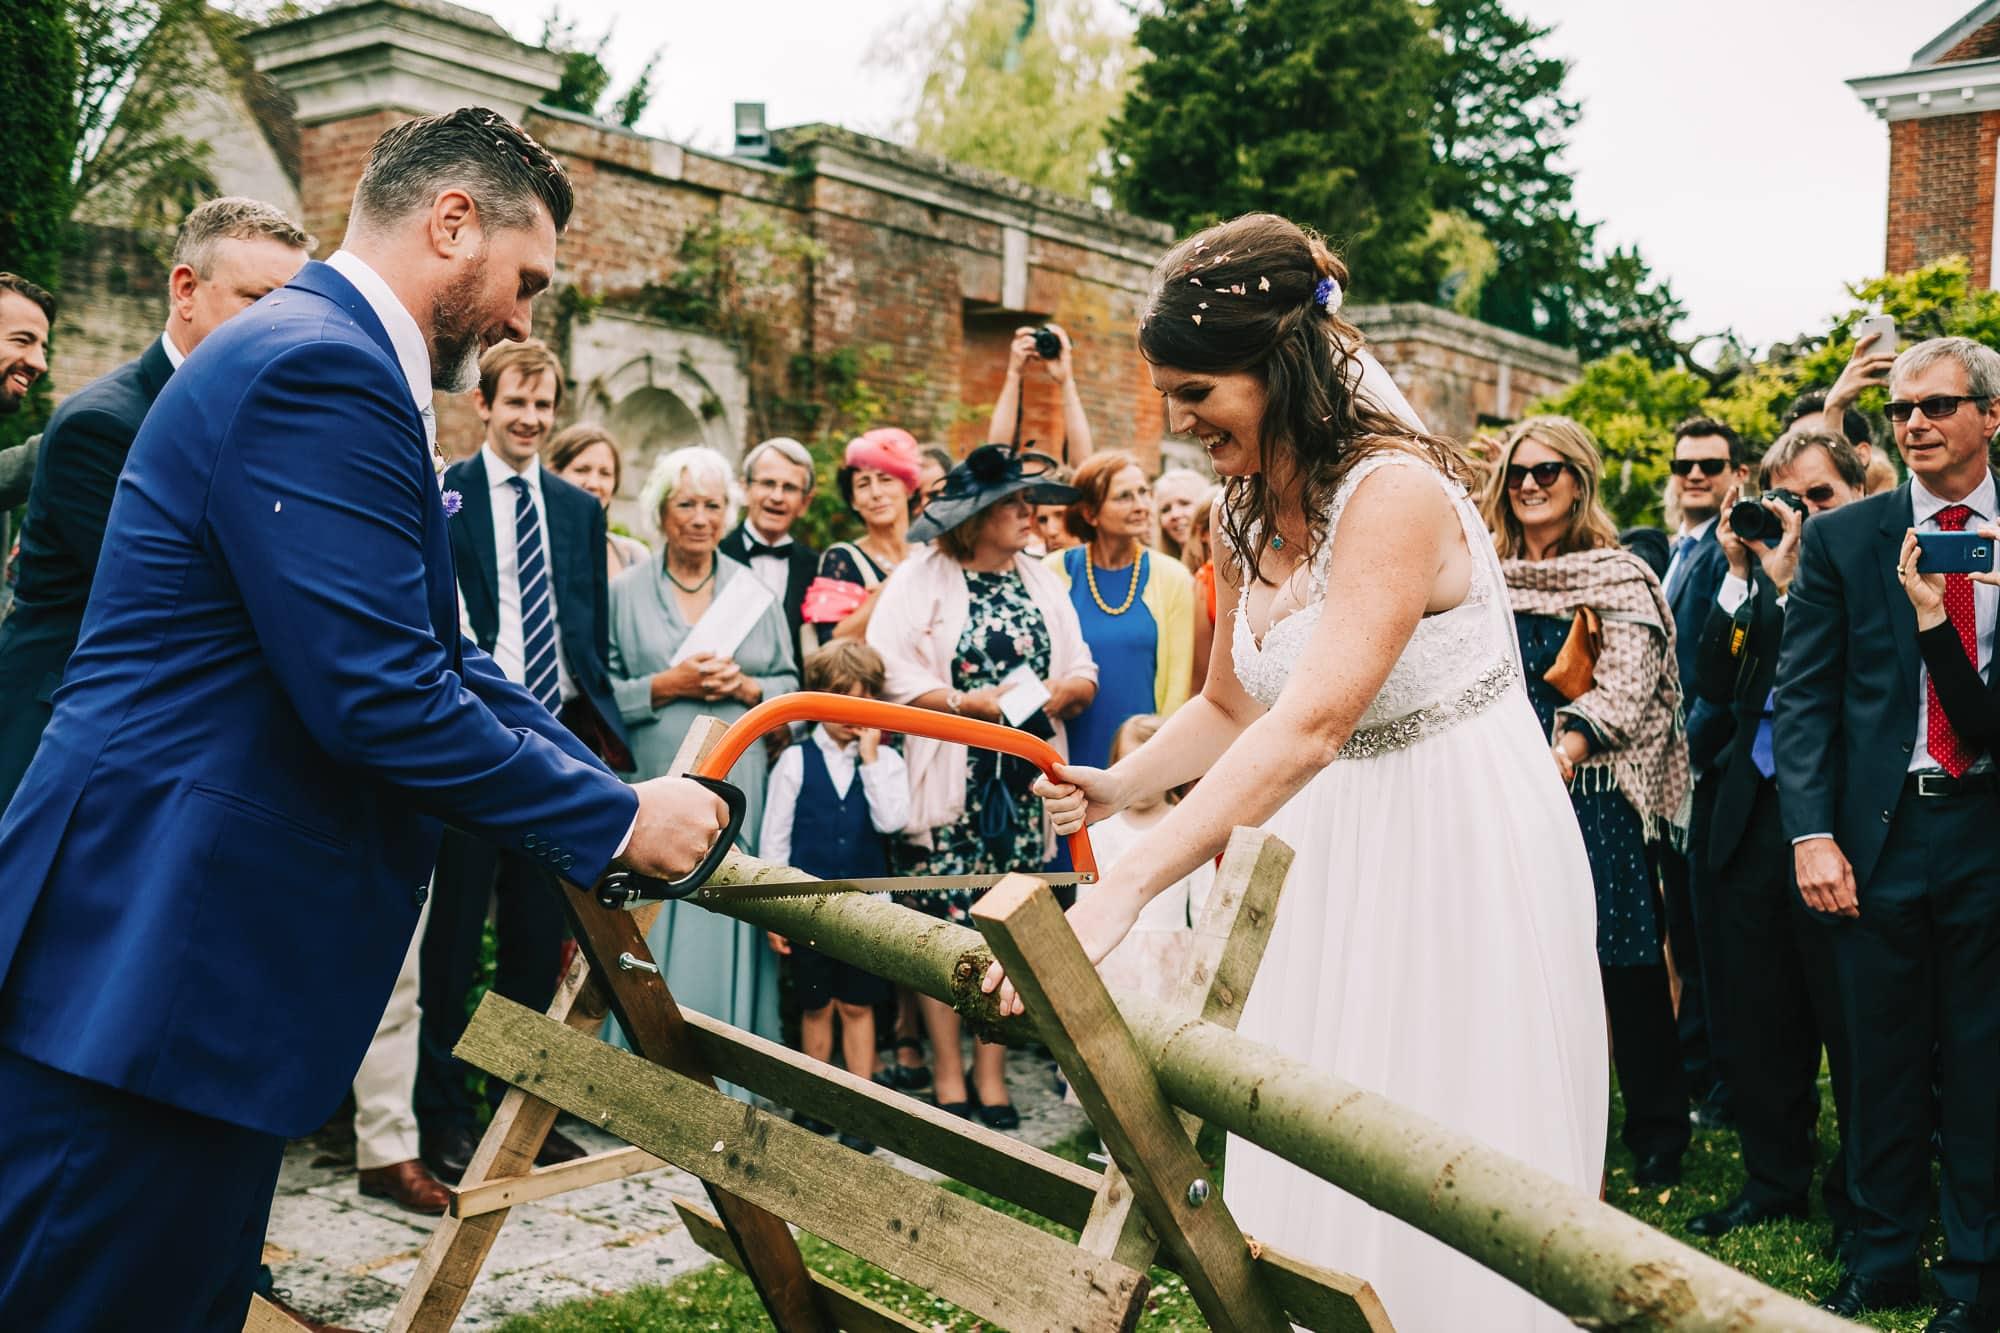 Canterbury Wedding Photographer - Bride having her makeup done